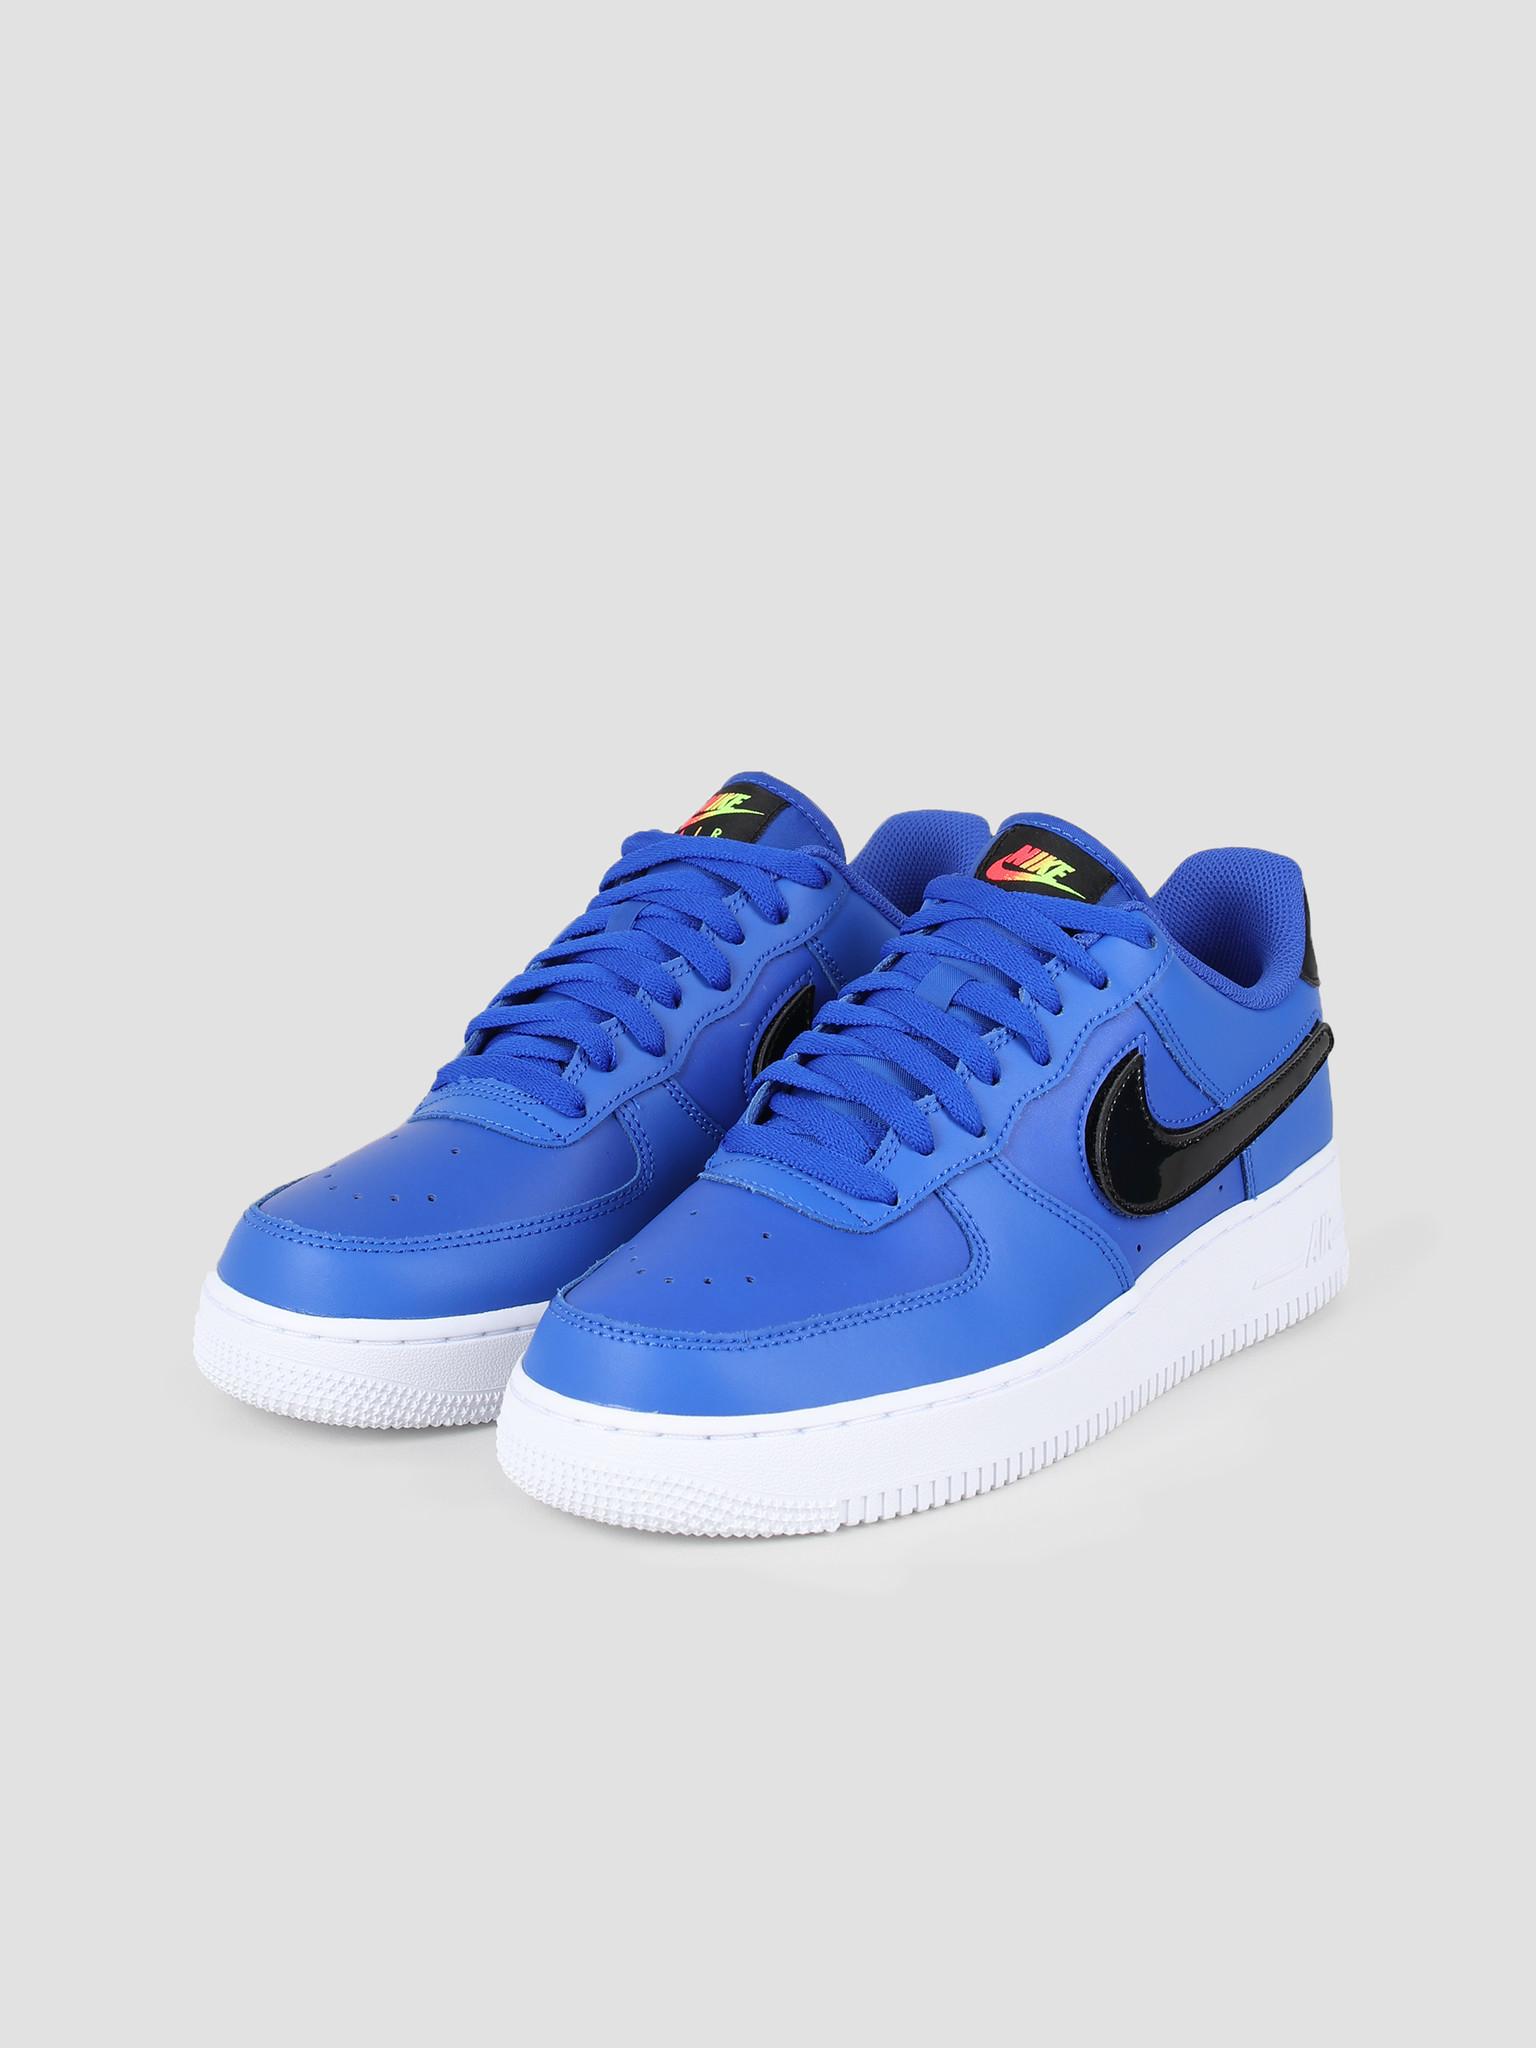 Nike Nike Air Force 1 07 Lv8 3 Racer Blue Vapor Green Black White CI0064-400